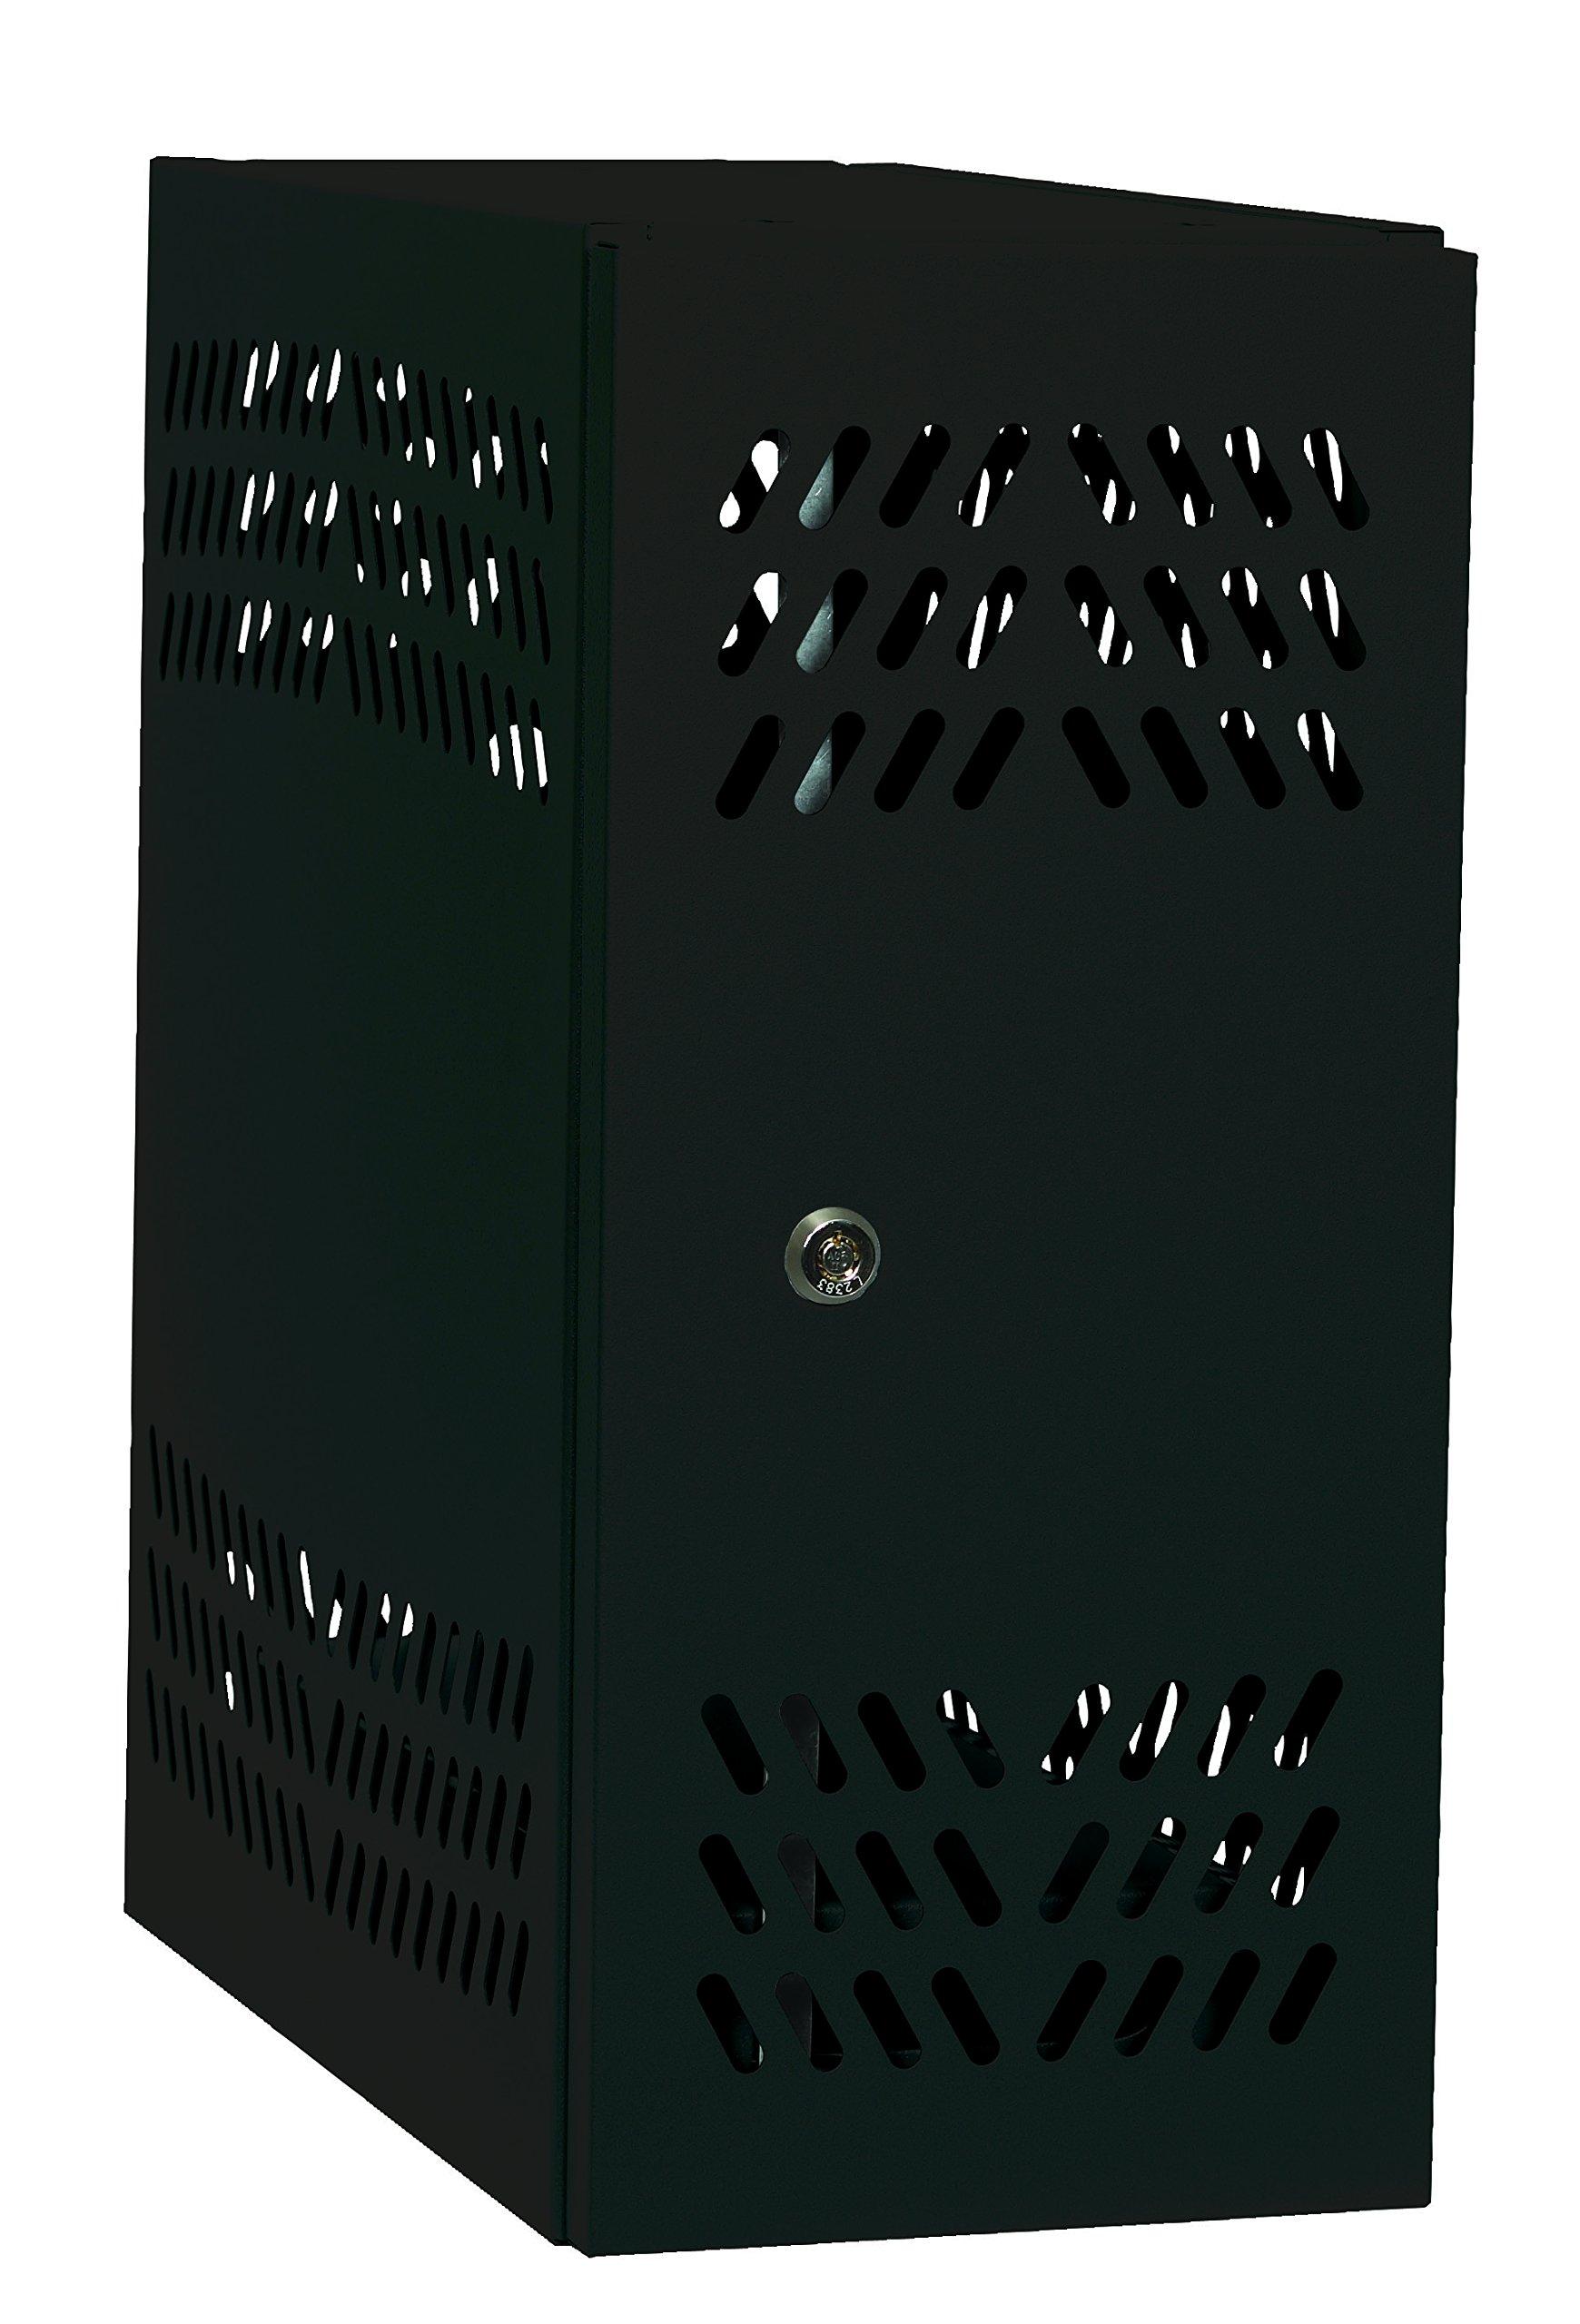 Datum Storage CPU2-T25 Intellerum CPU Locker, Large, Black